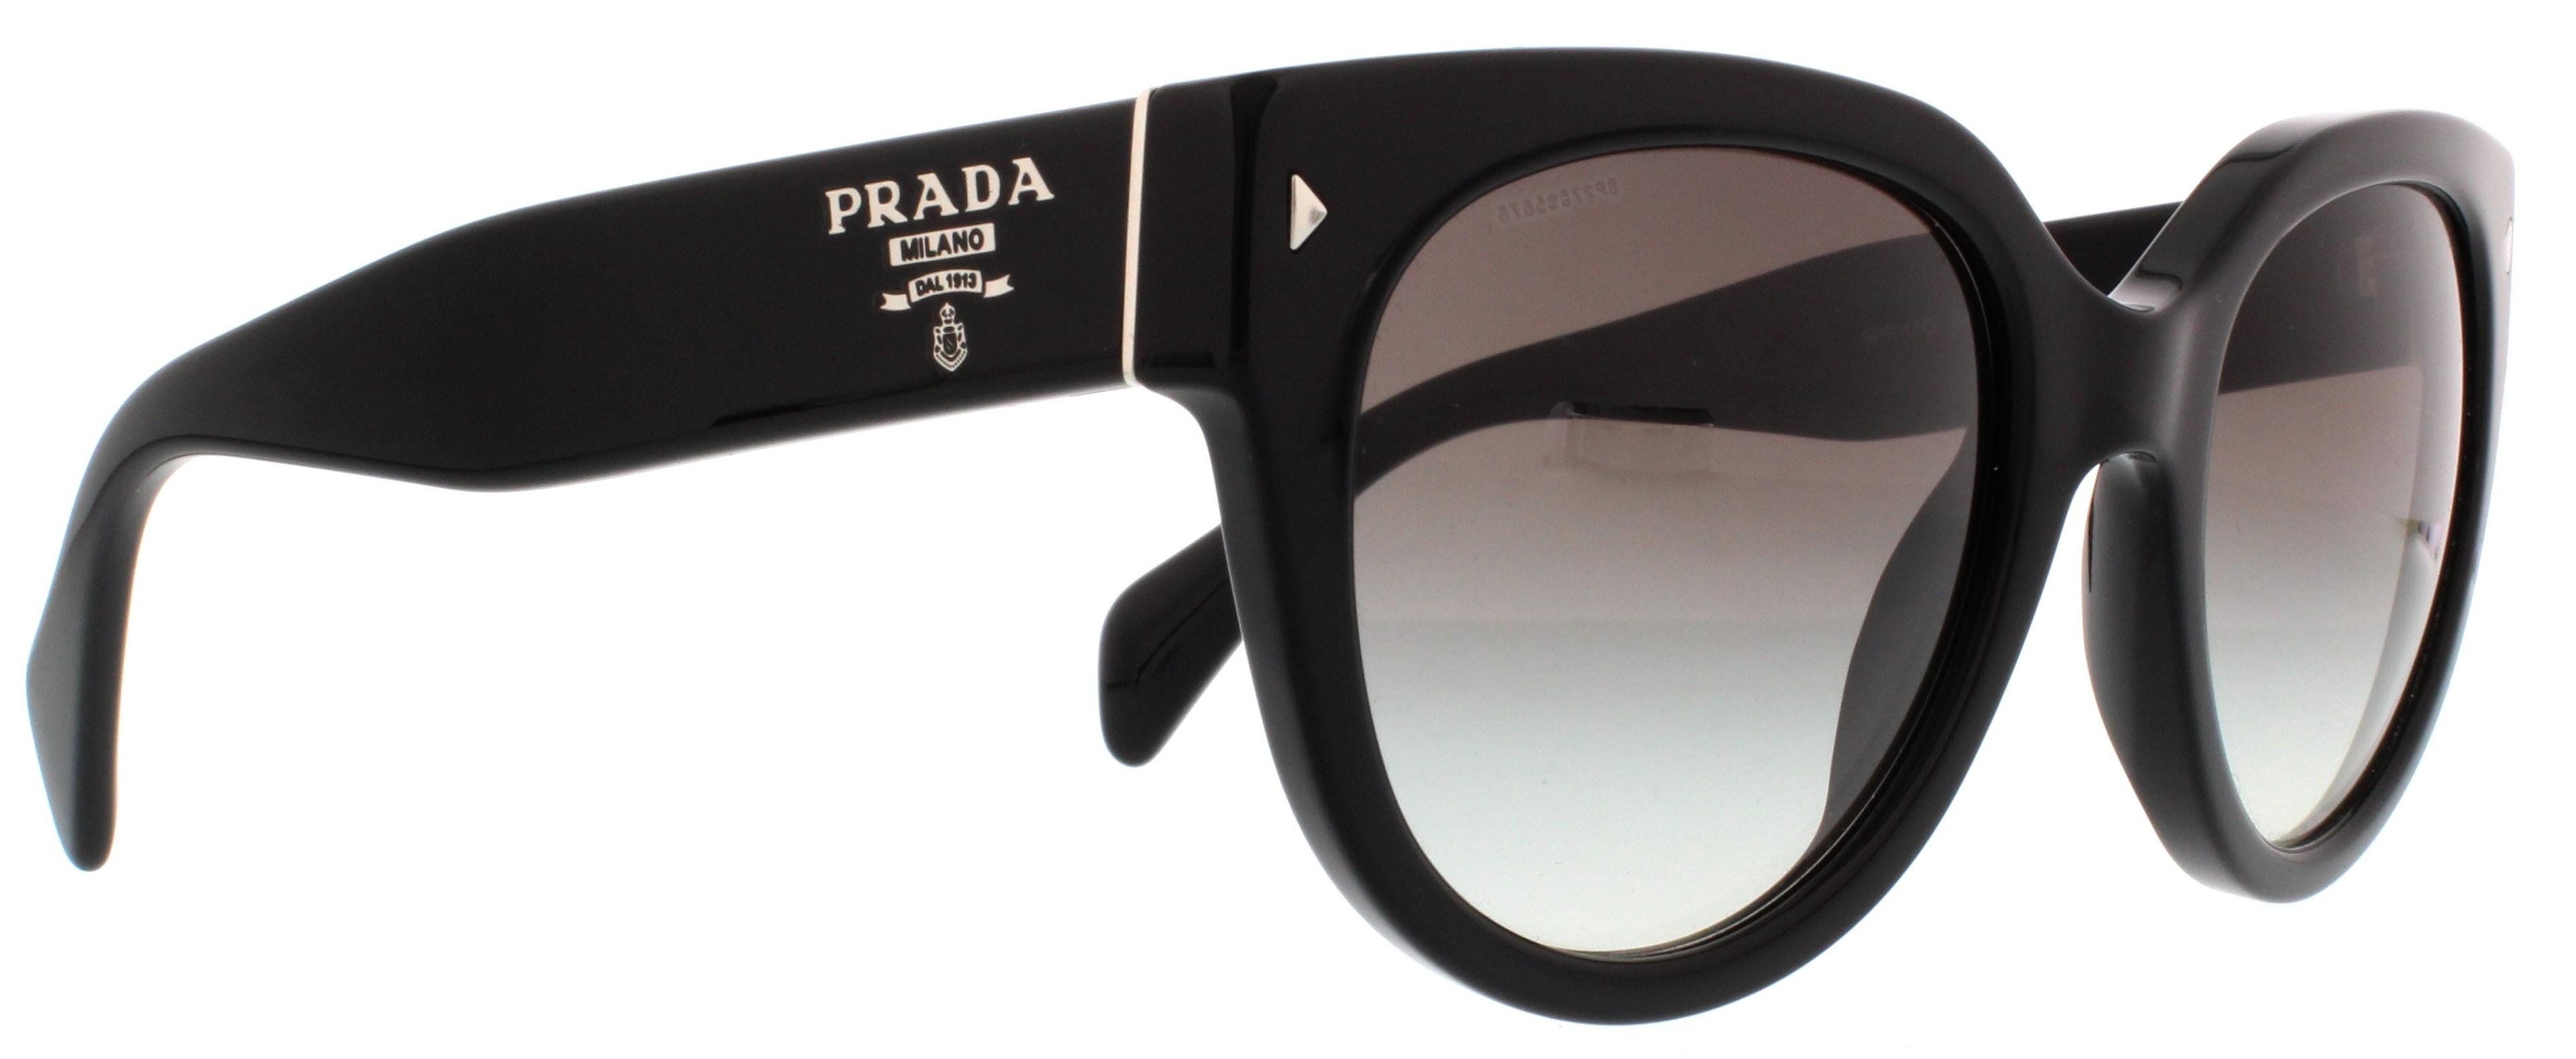 7aba60ac90106 official prada prada pr 17os shiny black cat eye brown gradient sunglasses  b3fa8 1864f  italy picture of prada sunglasses pr17os swing 29f9c 61655